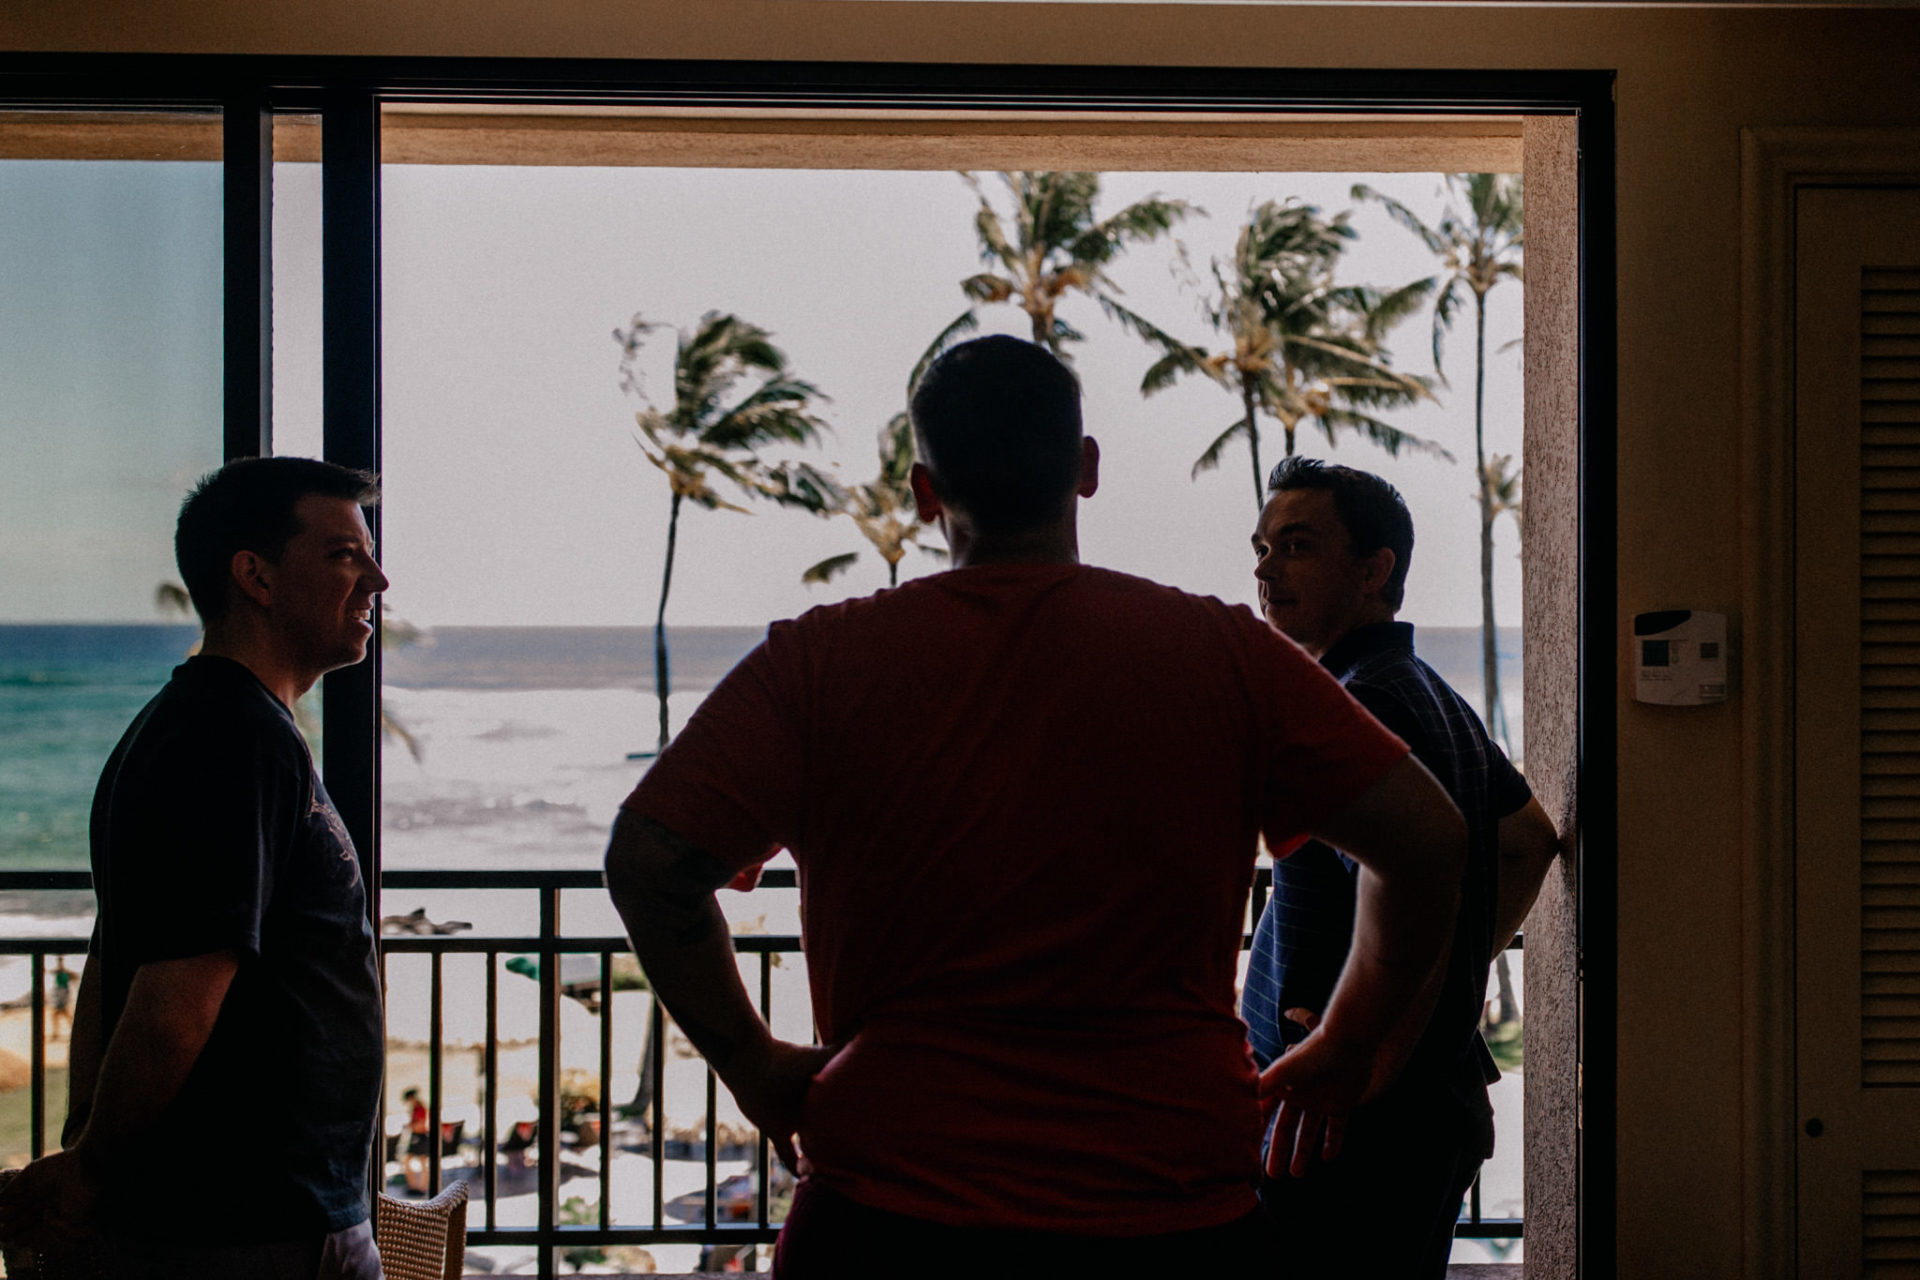 Hawaii Hochzeit-destination wedding kauai-Plantation Gardens Koloa Poipu-bräutigam getting ready